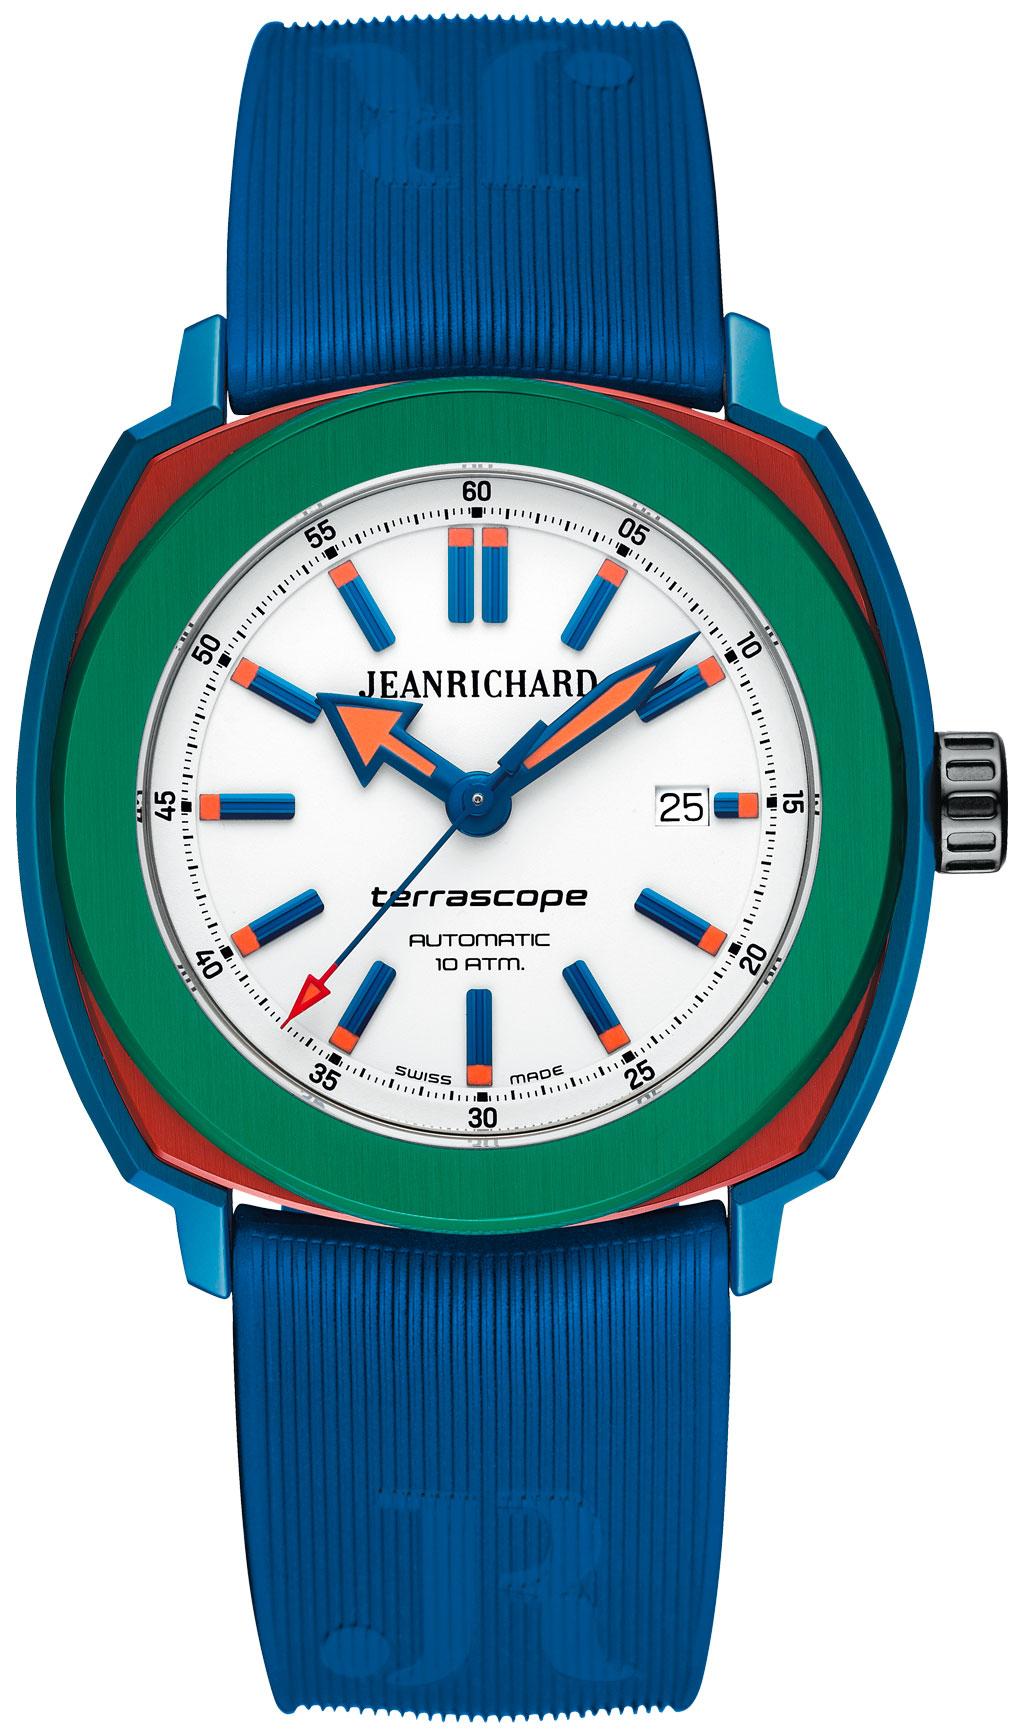 JeanRichard Terrascope azul rojo y verde